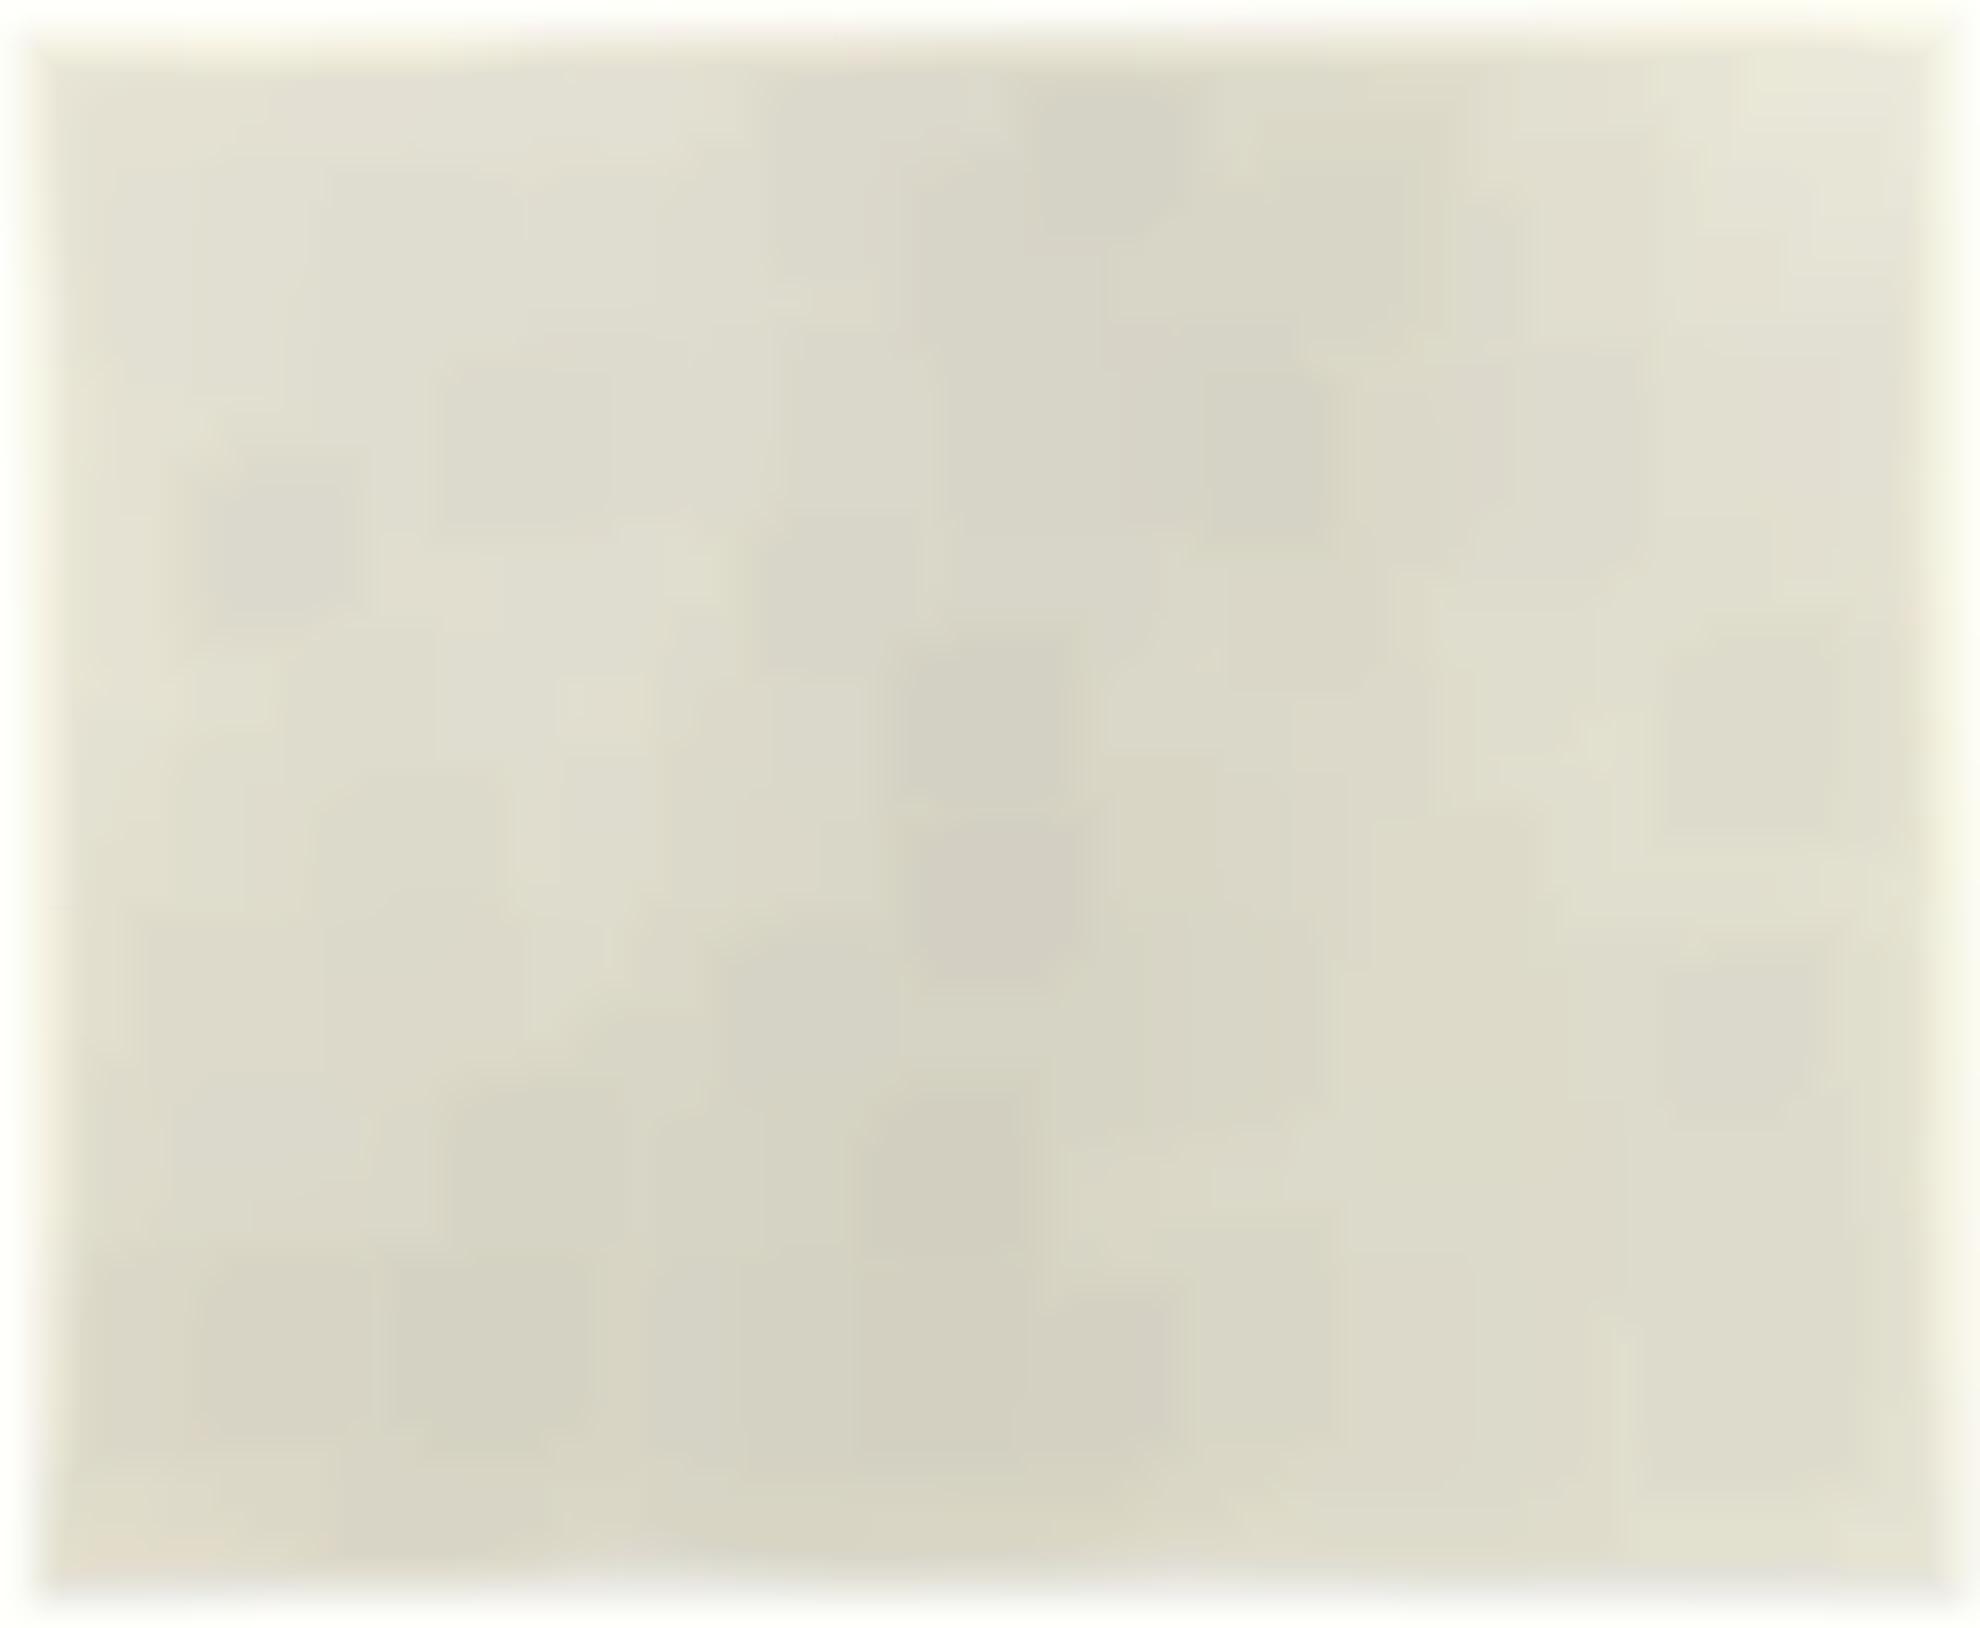 Park Seo-bo-Ecriture No. 45-75-1975